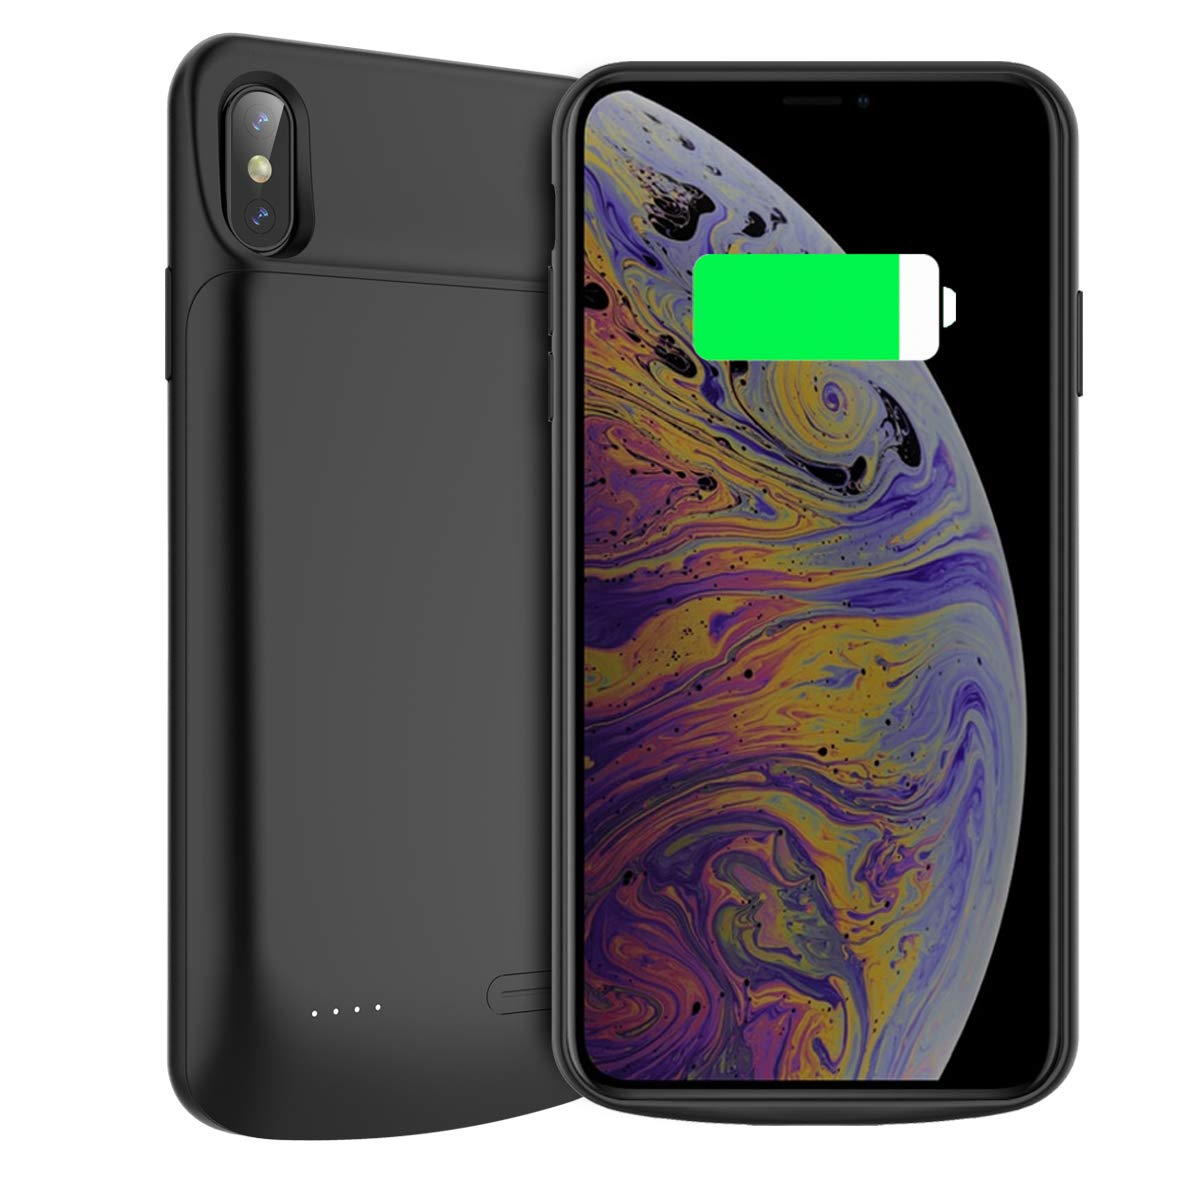 Happon Funda Bateria iPhone XS MAX, 6000mAh Batería Cargador Externa Ultra Carcasa Batería Recargable Power Bank Portatil para iPhone XS MAX - Negro